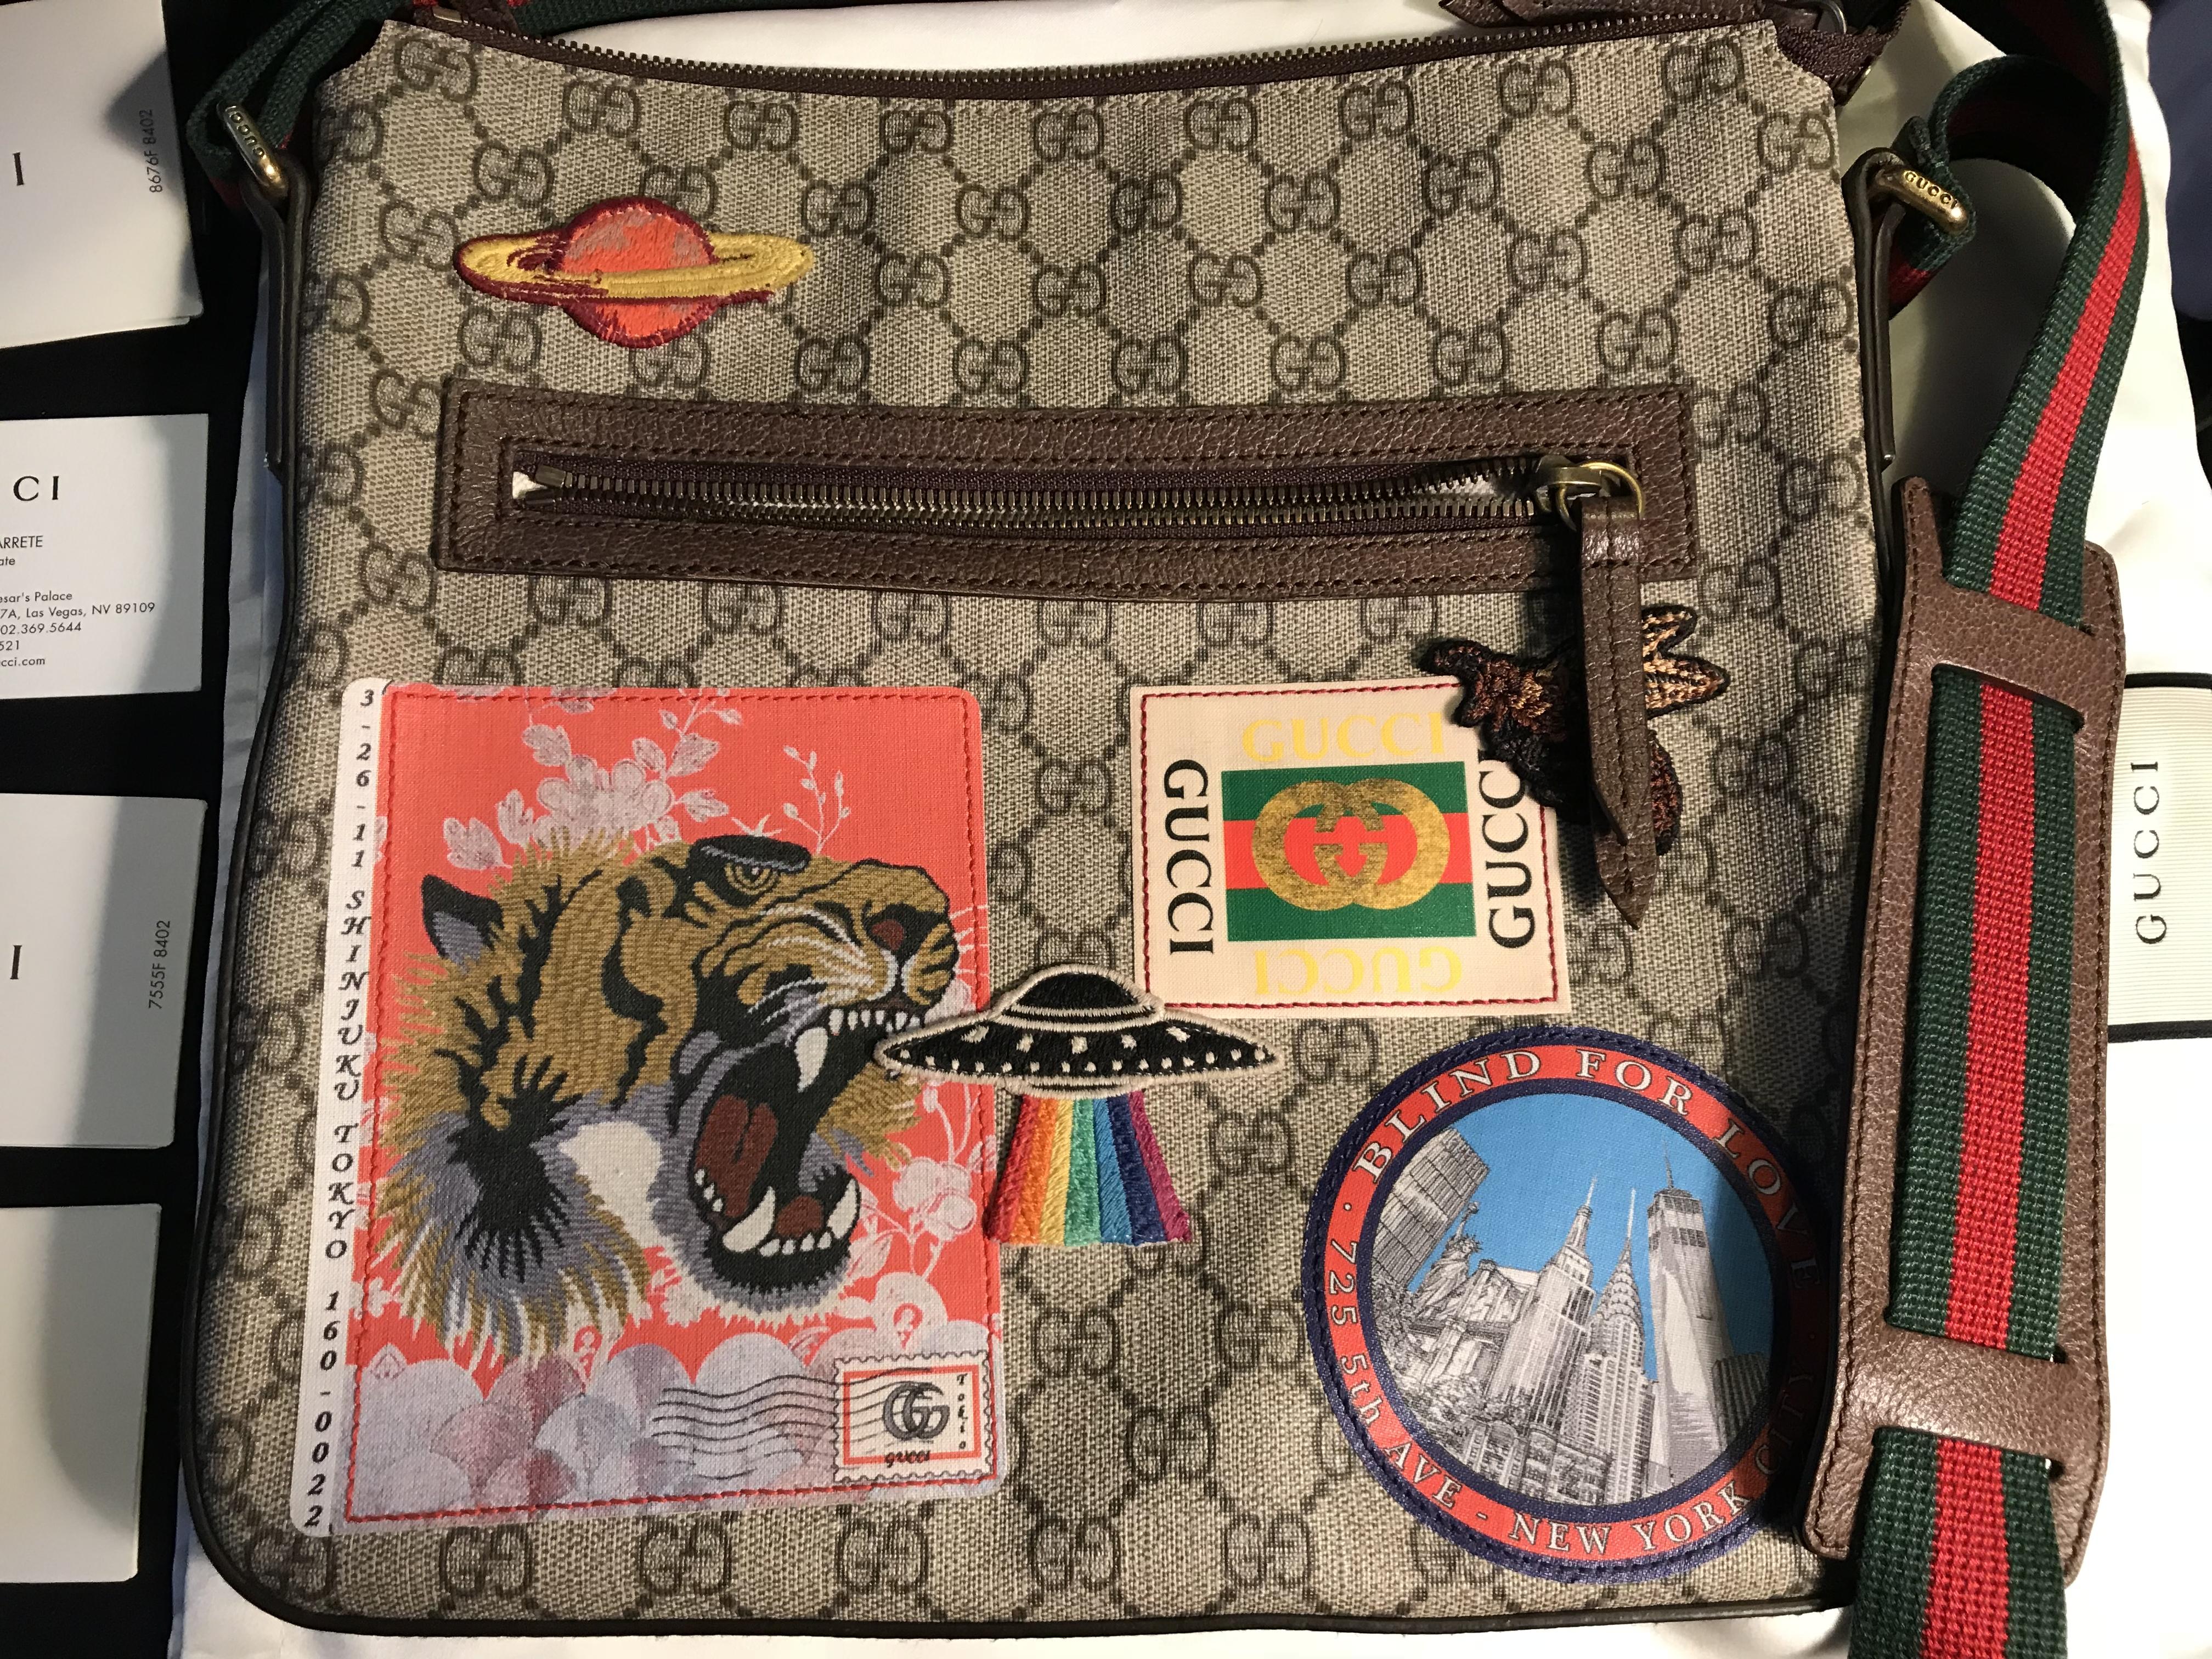 bad066619a88 Gucci Gucci Courrier Soft Gg Supreme Messenger | Grailed